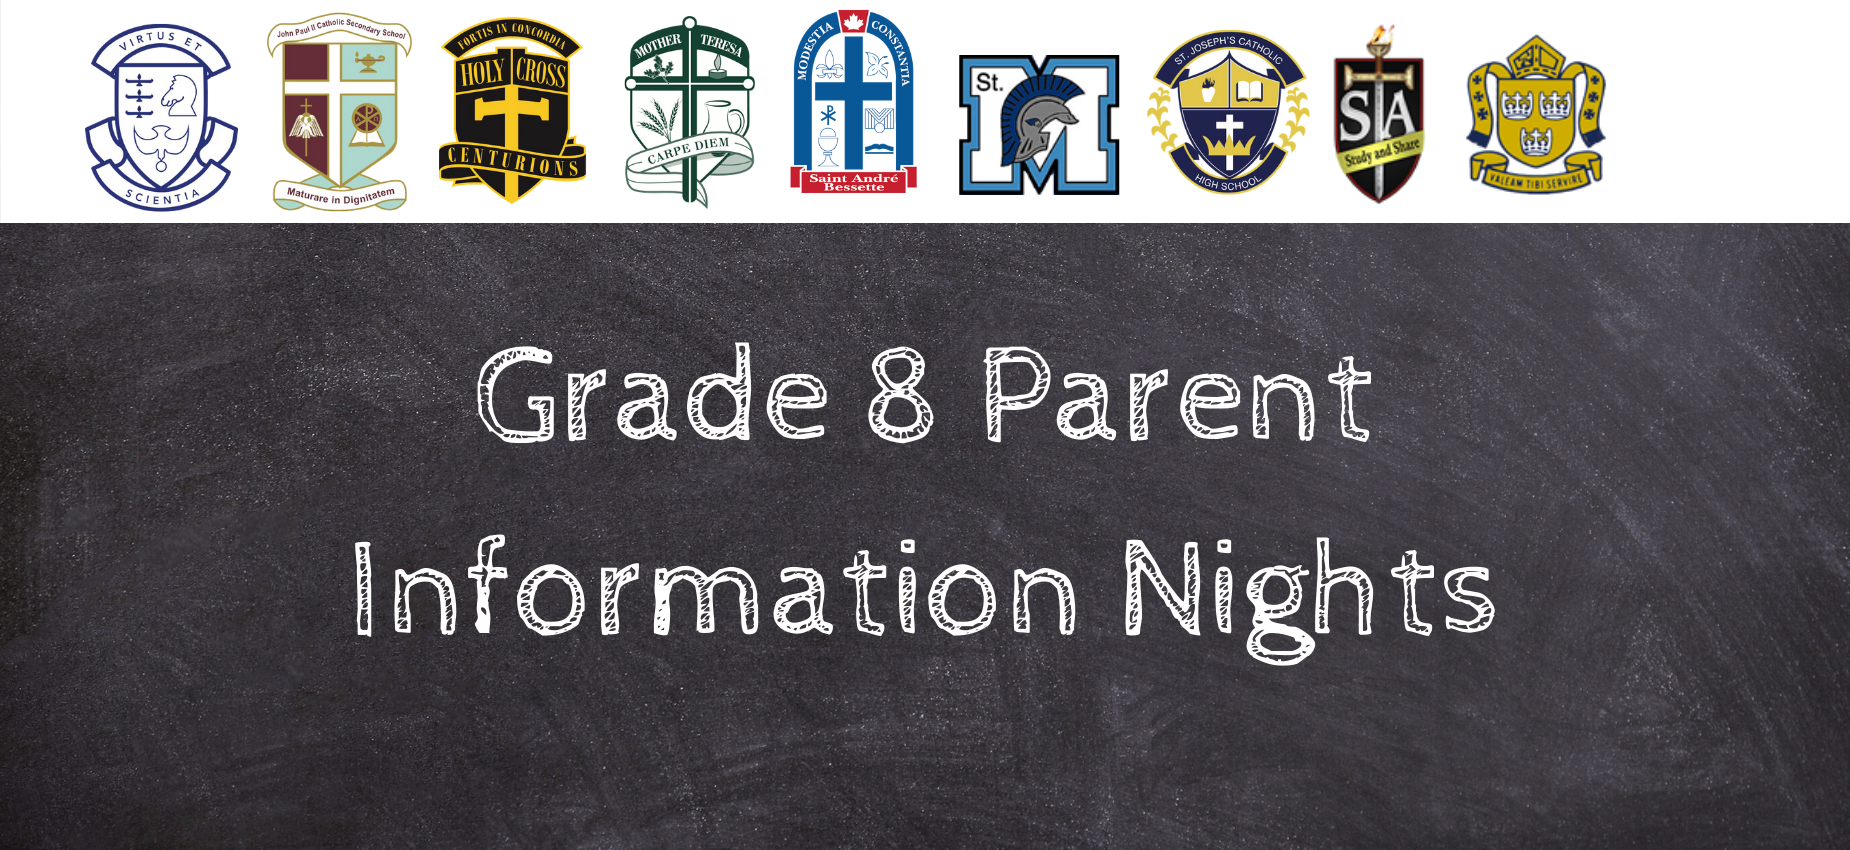 Grade 8 Parent Information Nights